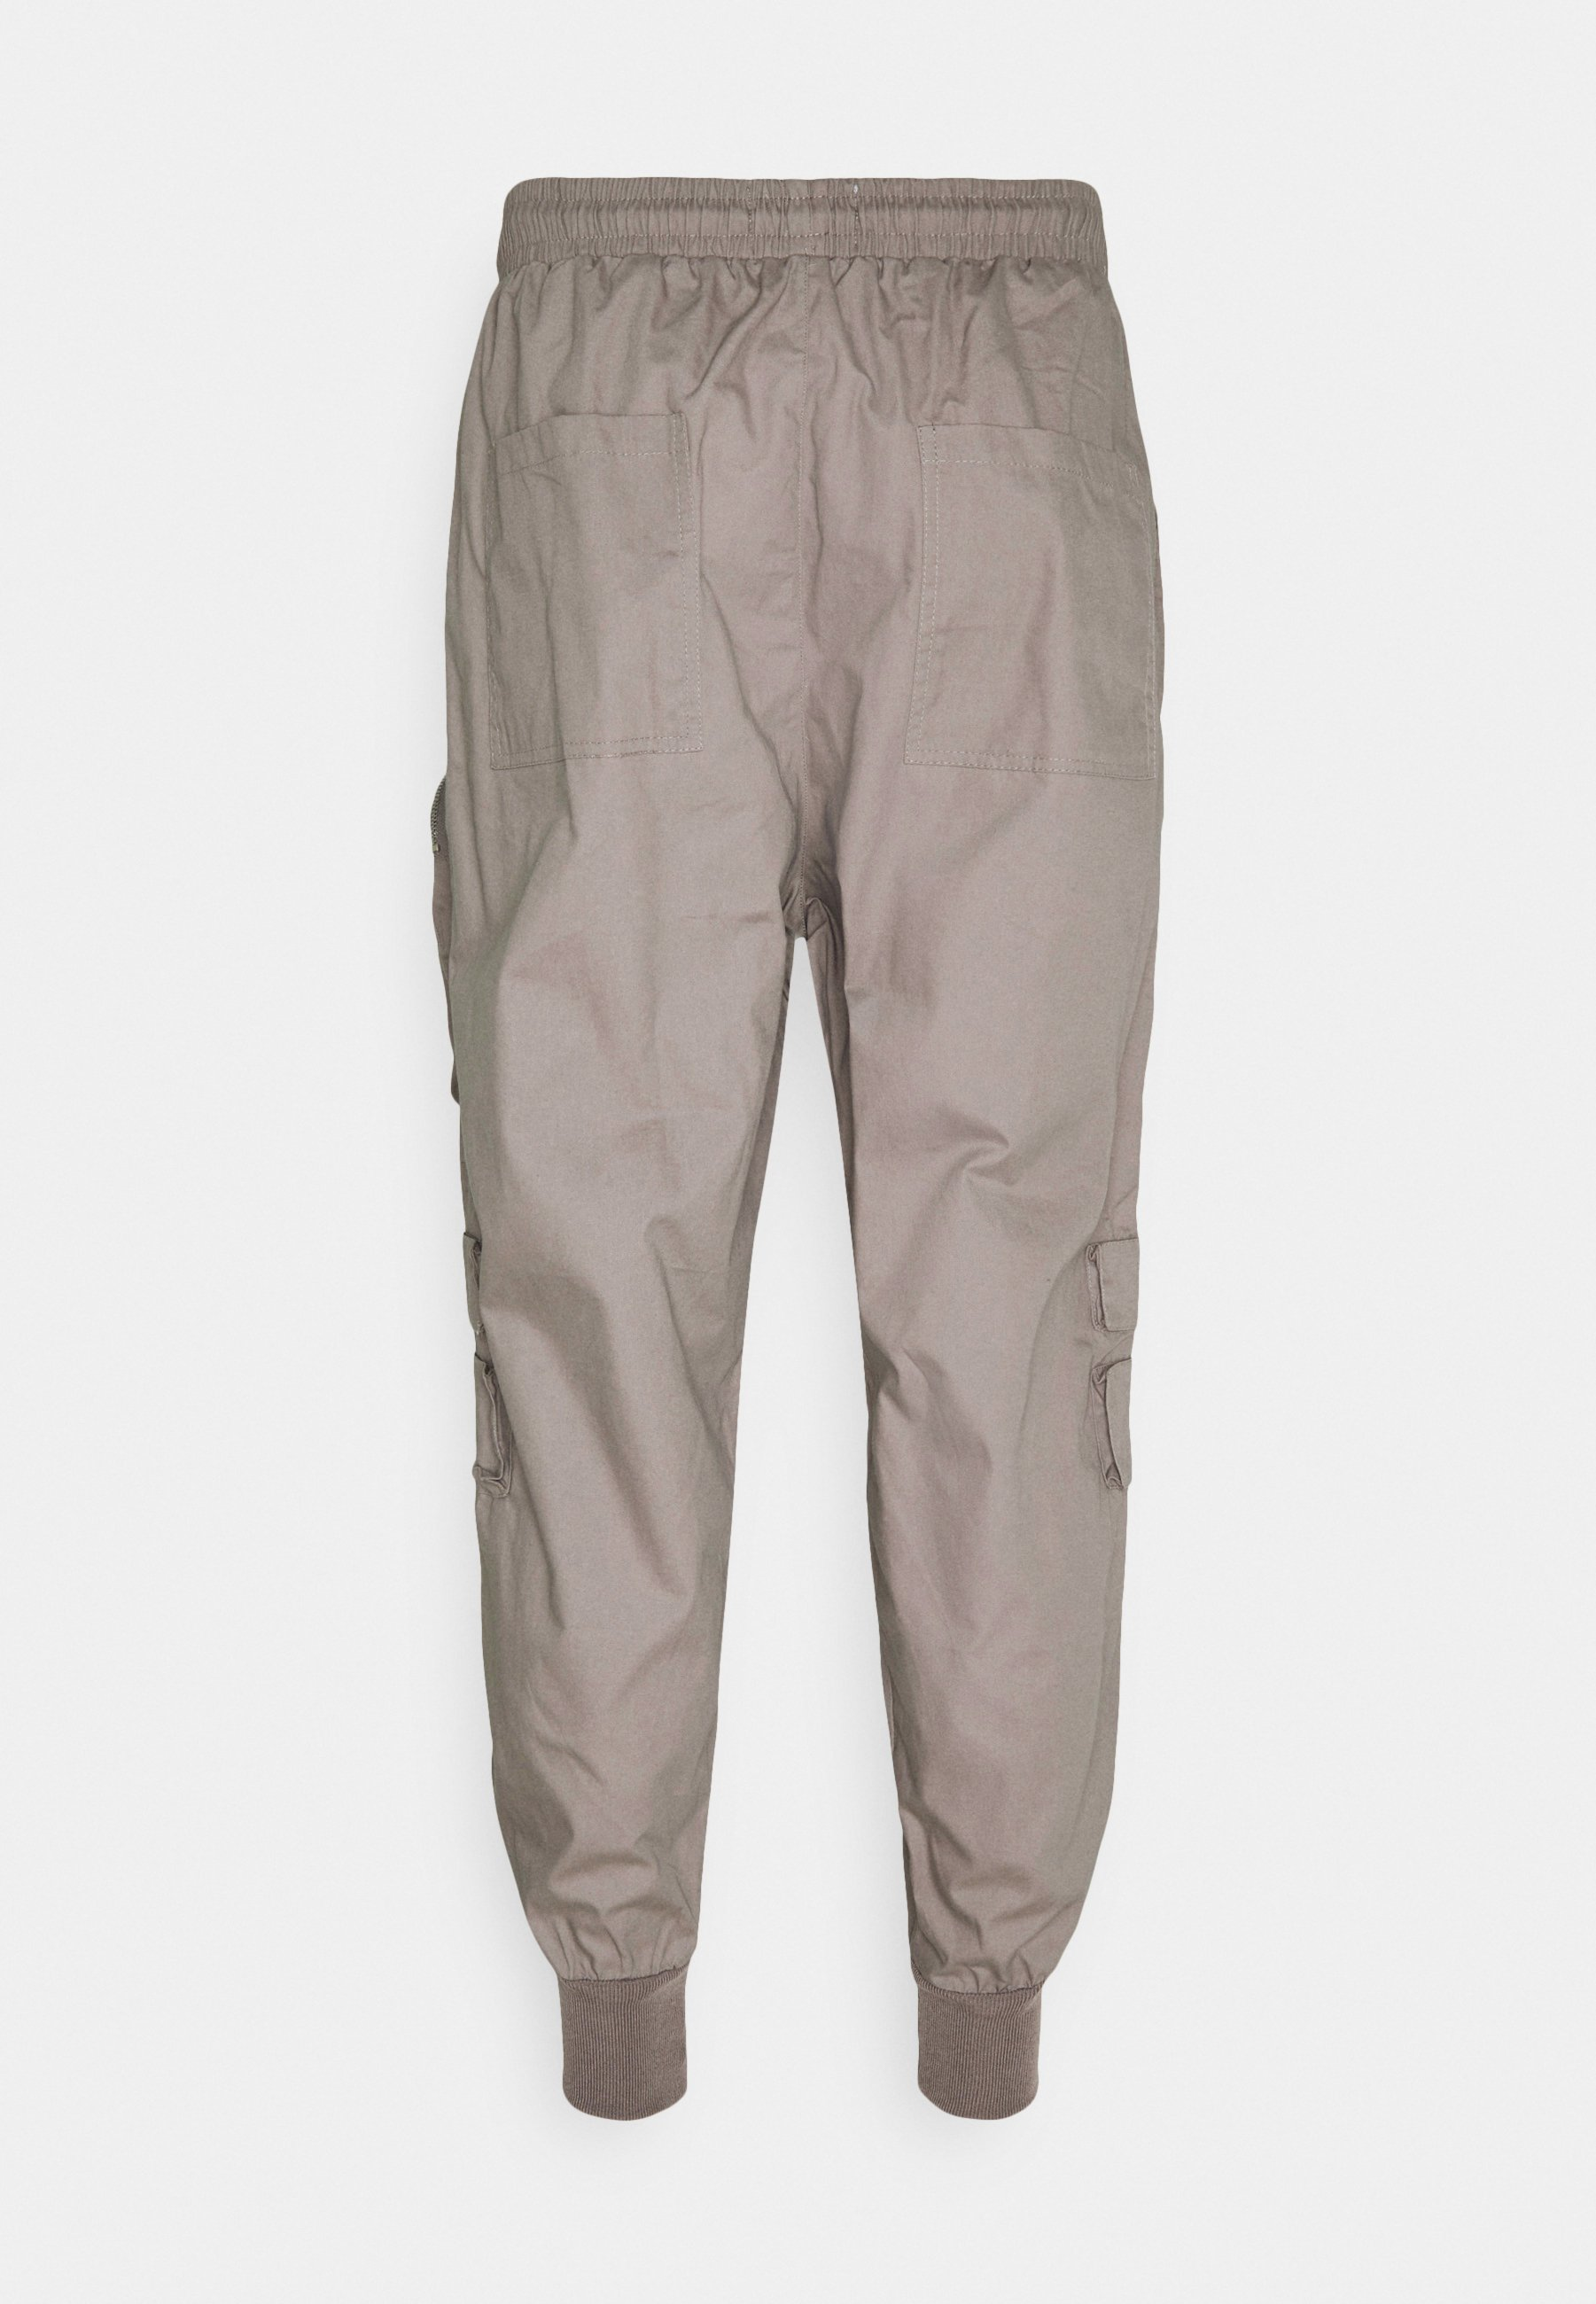 Homme FRONT ZIP POCKET PANT - Pantalon cargo